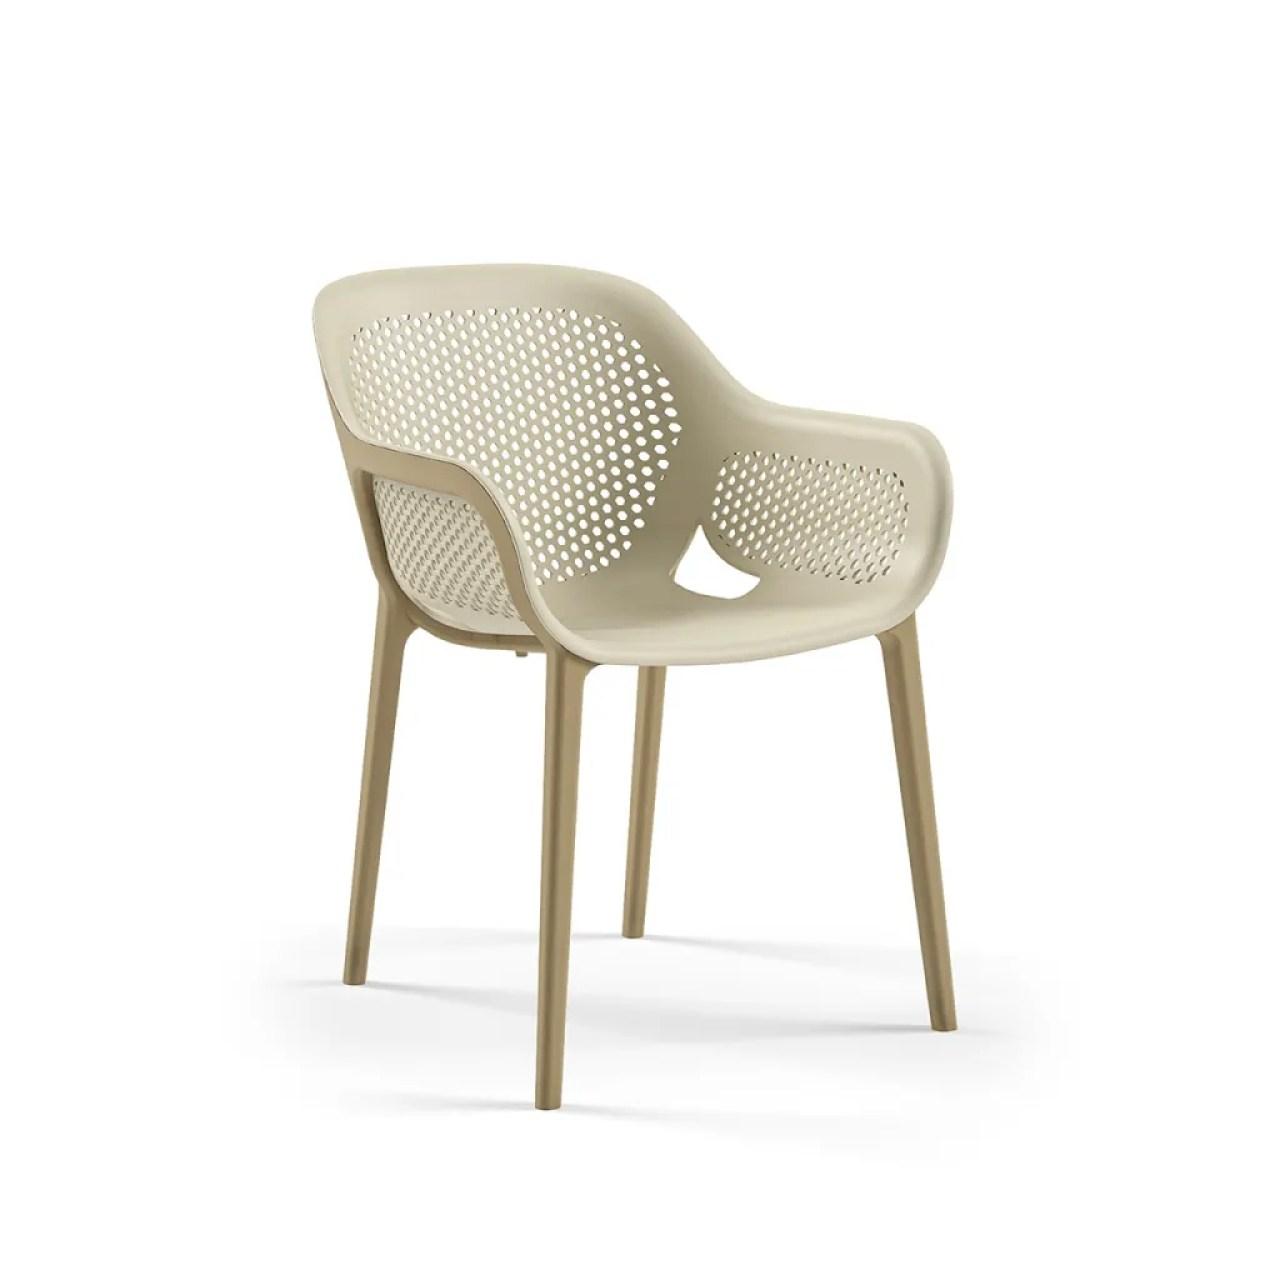 The Atra armchair, designed by Kilit Taşı Design founder Kunter Şekercioğlu for Tilia